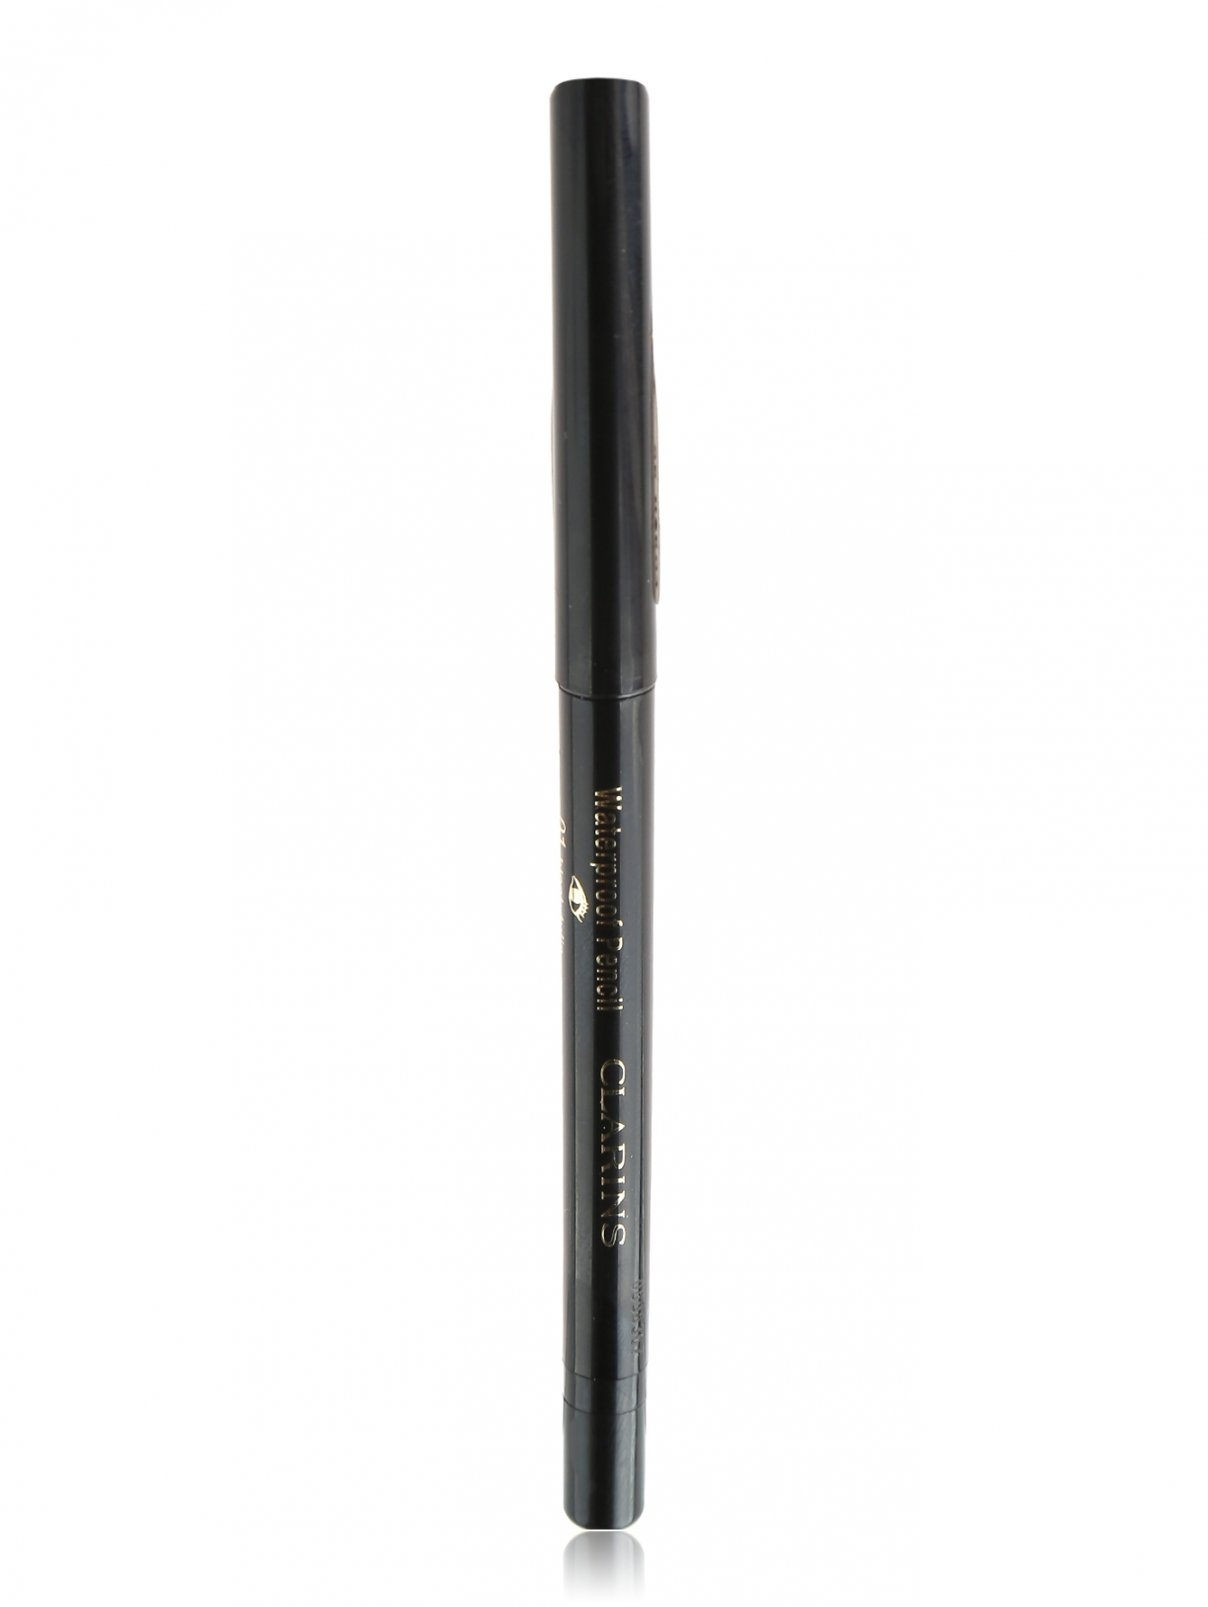 Карандаш для глаз Waterproof Pencil 06 Makeup Clarins  –  Общий вид